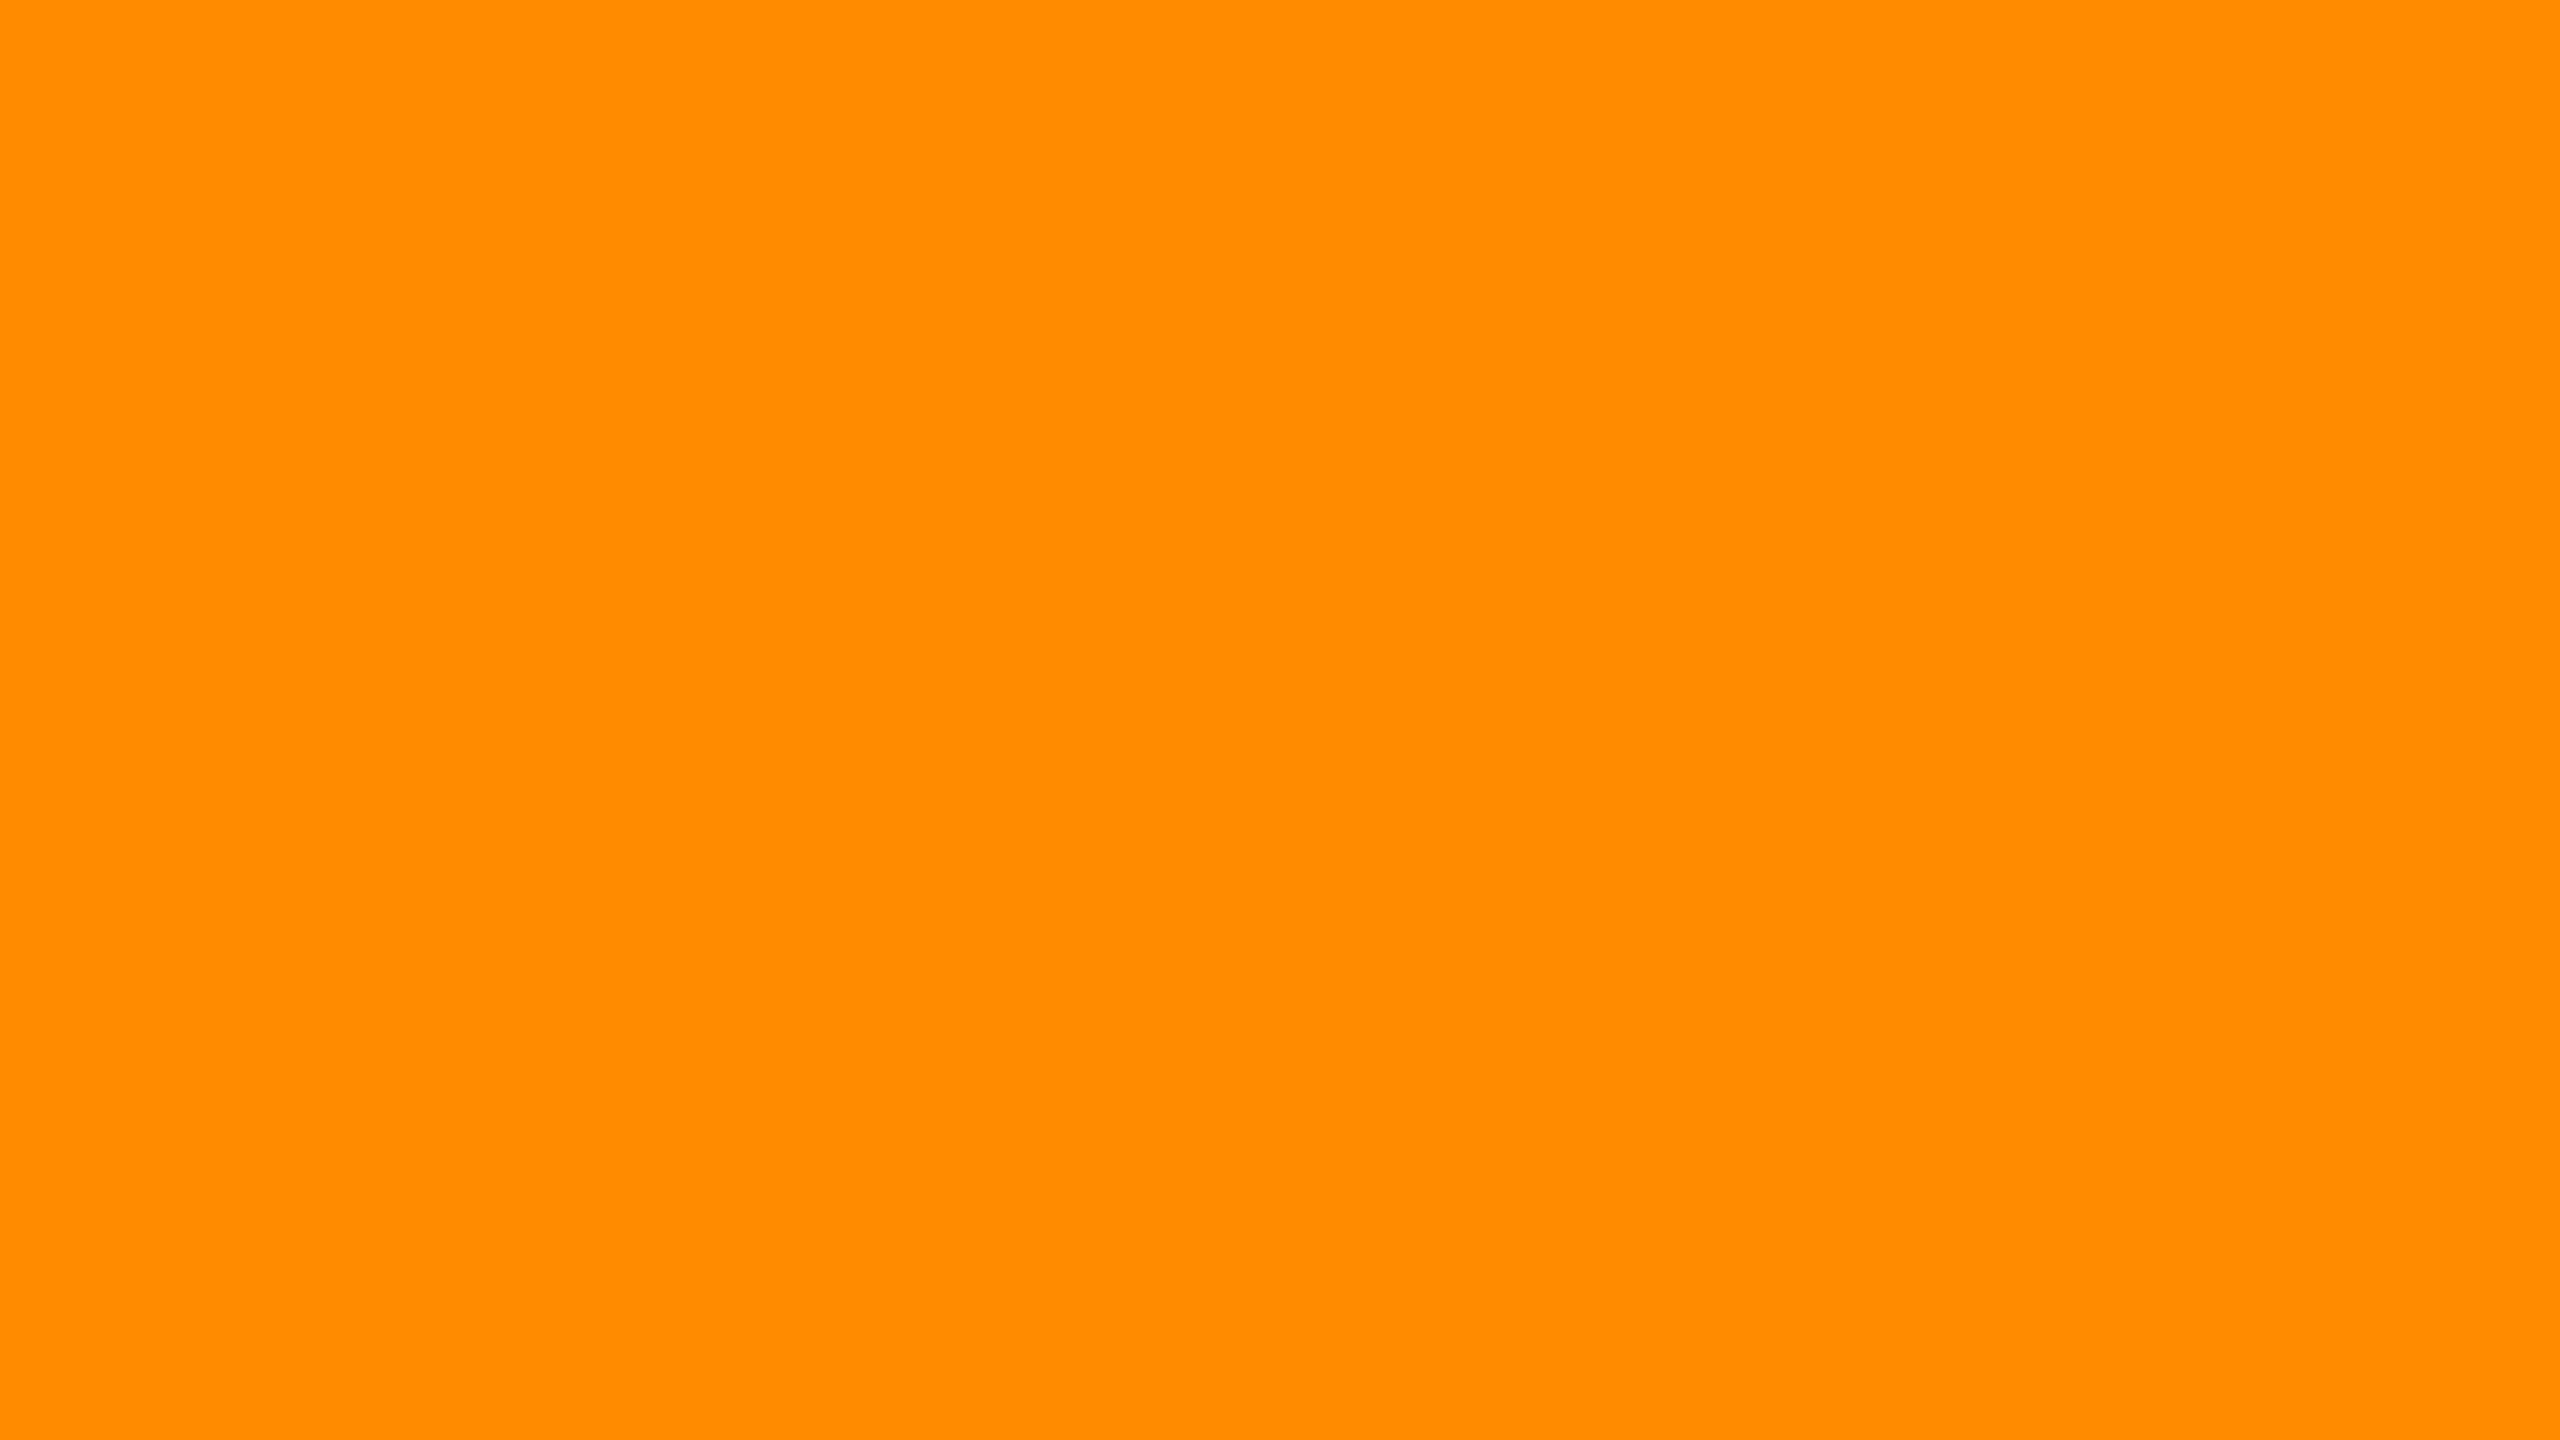 2560x1440 Dark Orange Solid Color Background